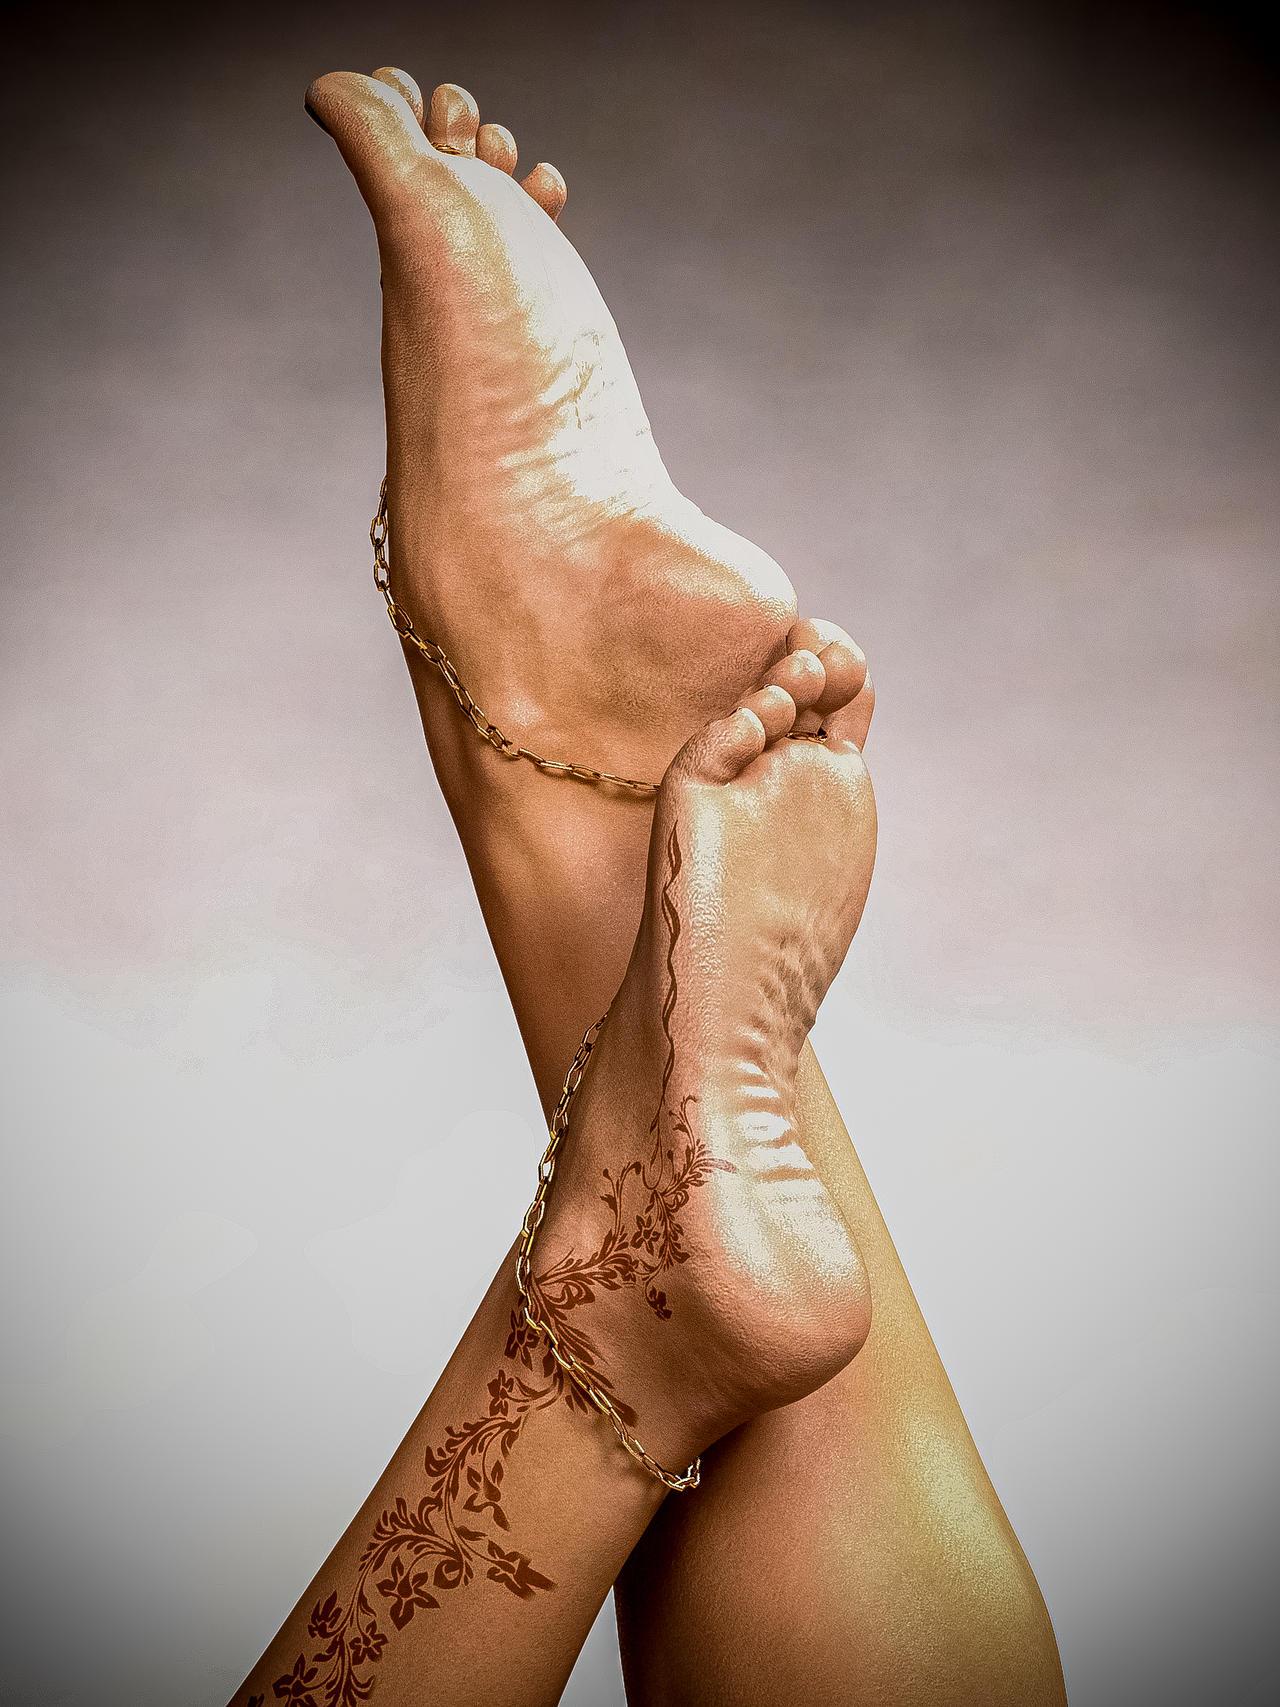 Decorated Feet